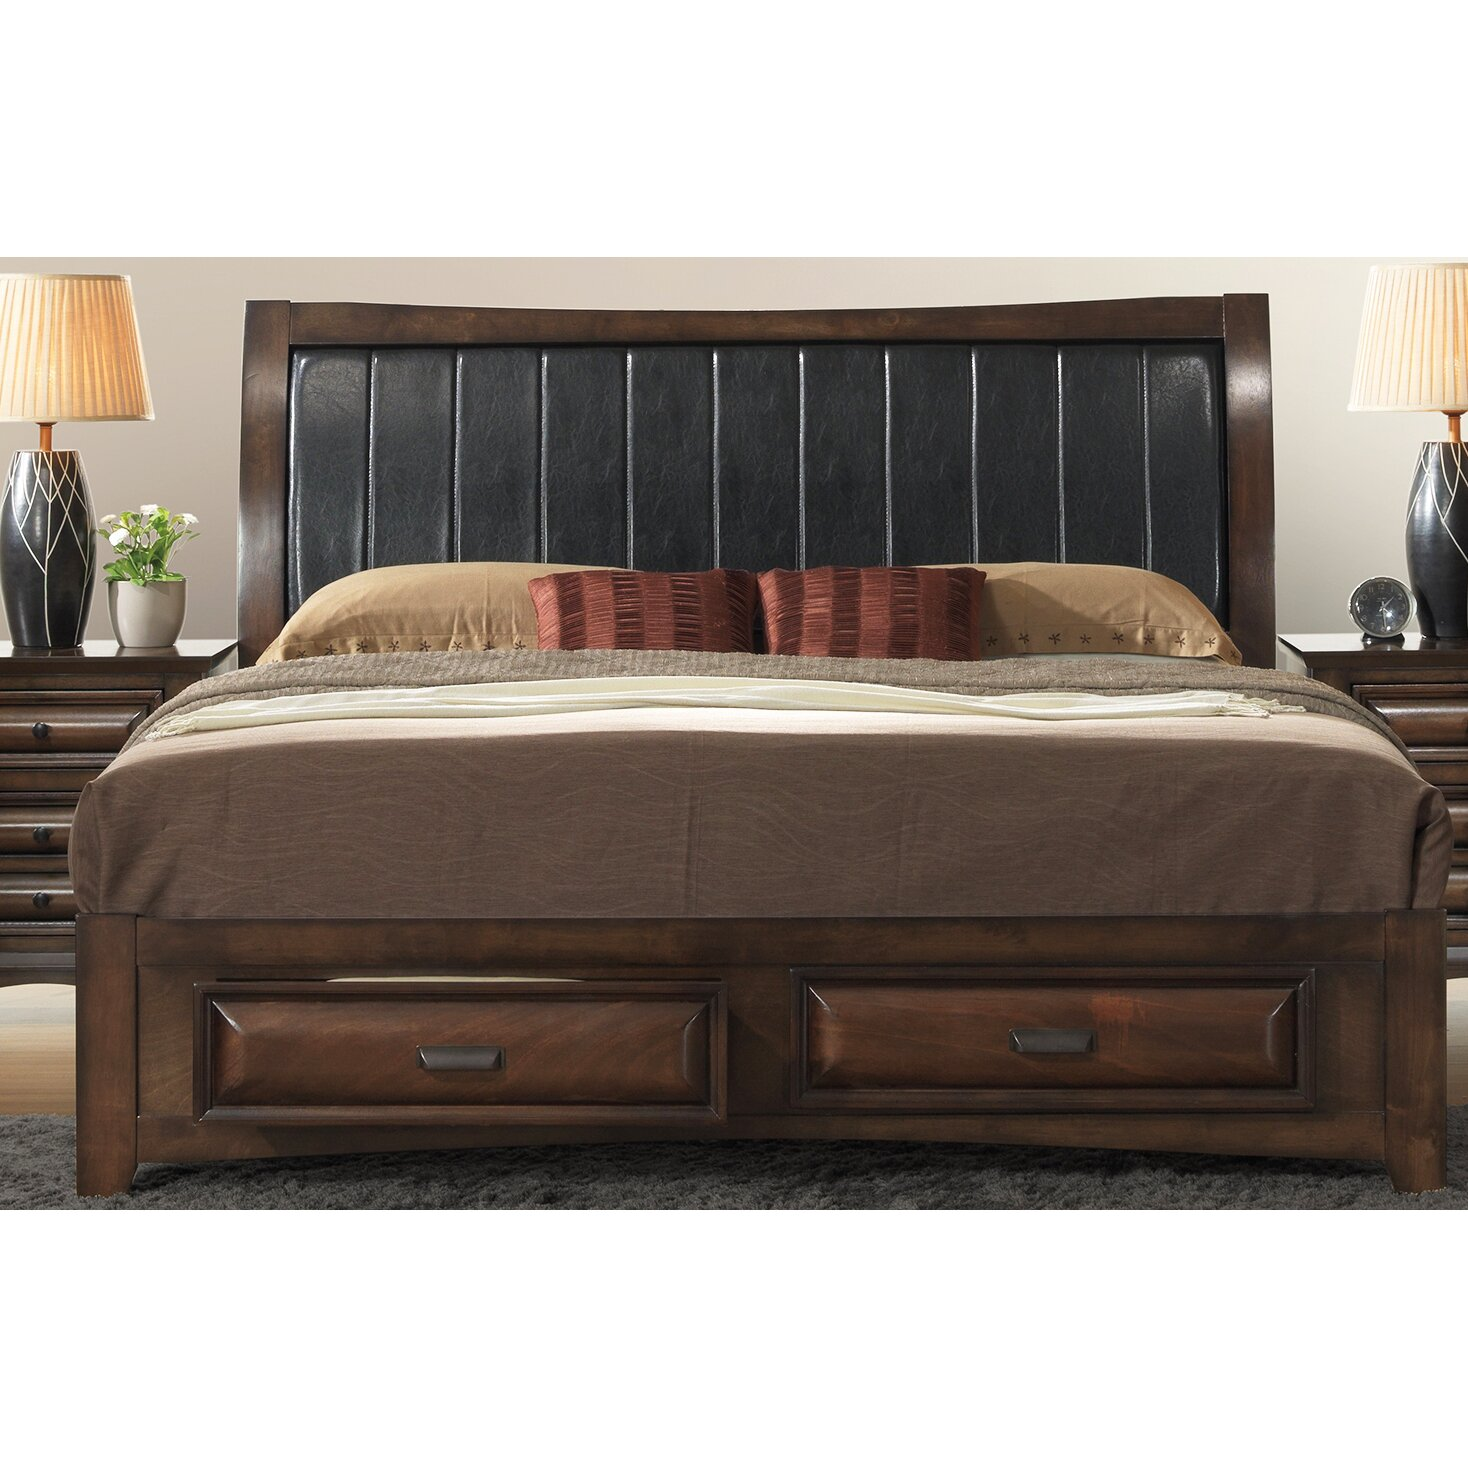 Roundhill Furniture Broval Panel 5 Piece Bedroom Set